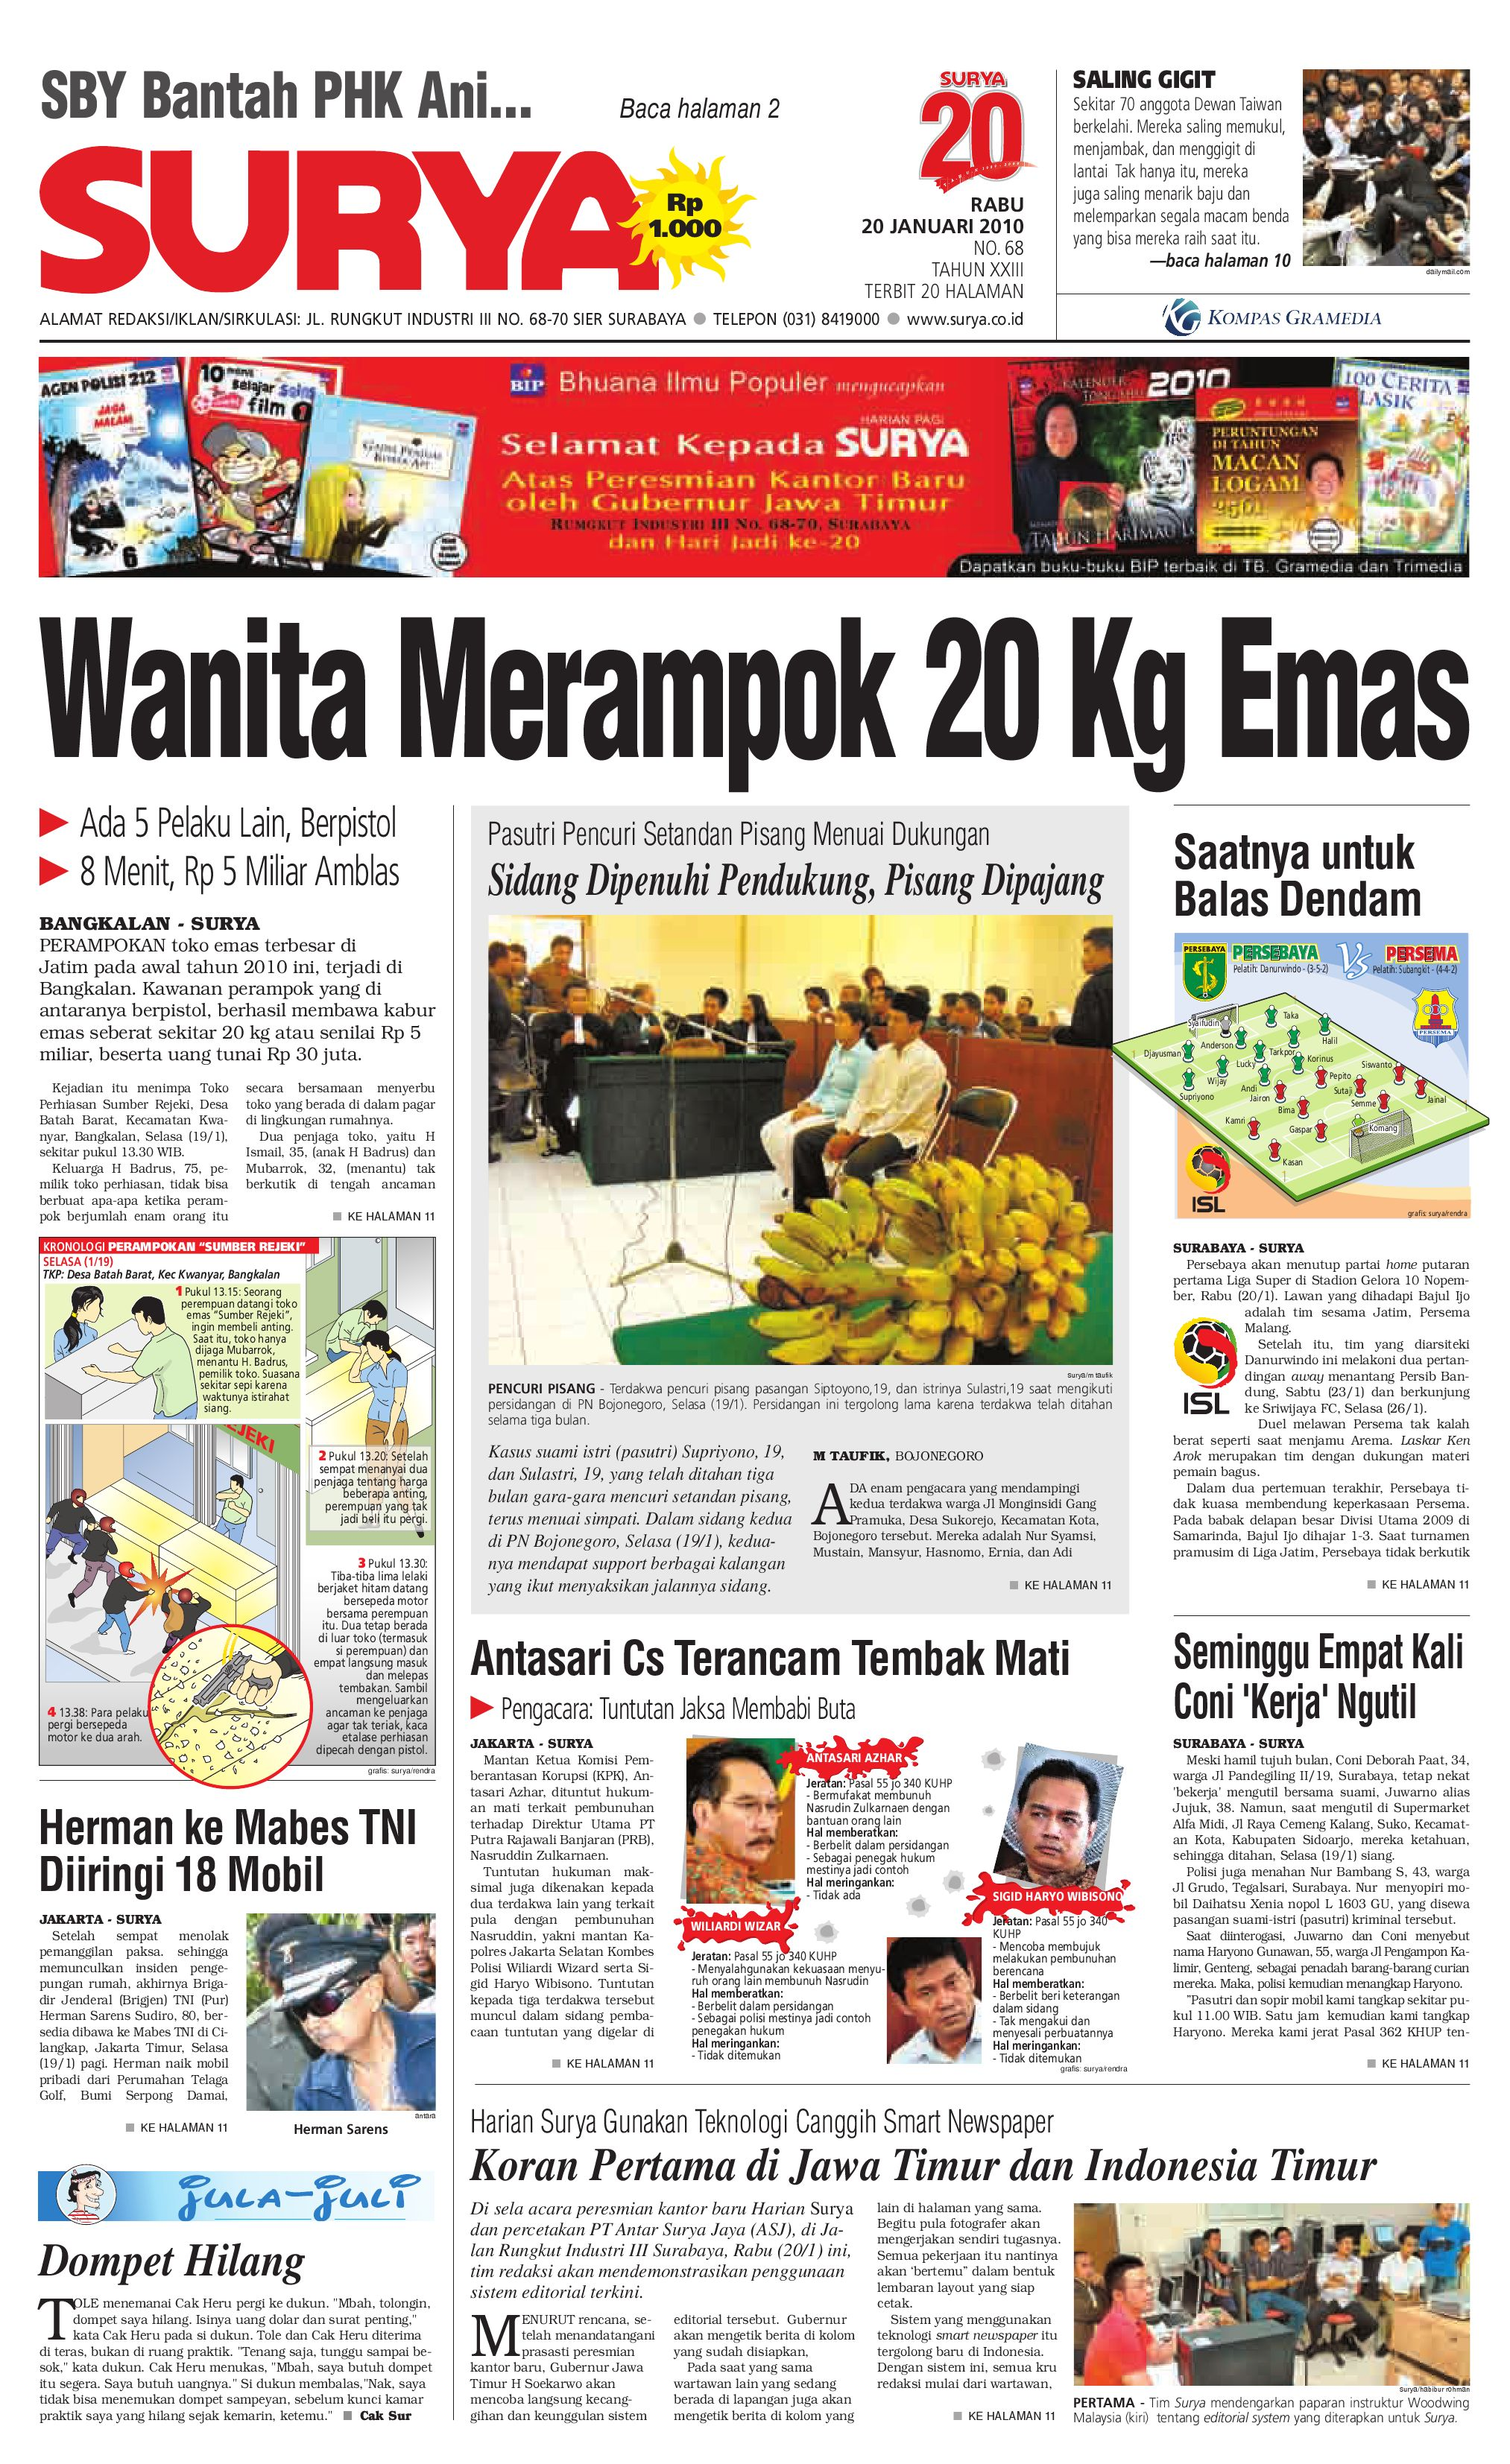 Surya Edisi Cetak 20 Jan 2010 By Harian Issuu Kopi Bubuk Hitam Kapal Api Tanpa Gula 10x6 5 Gram